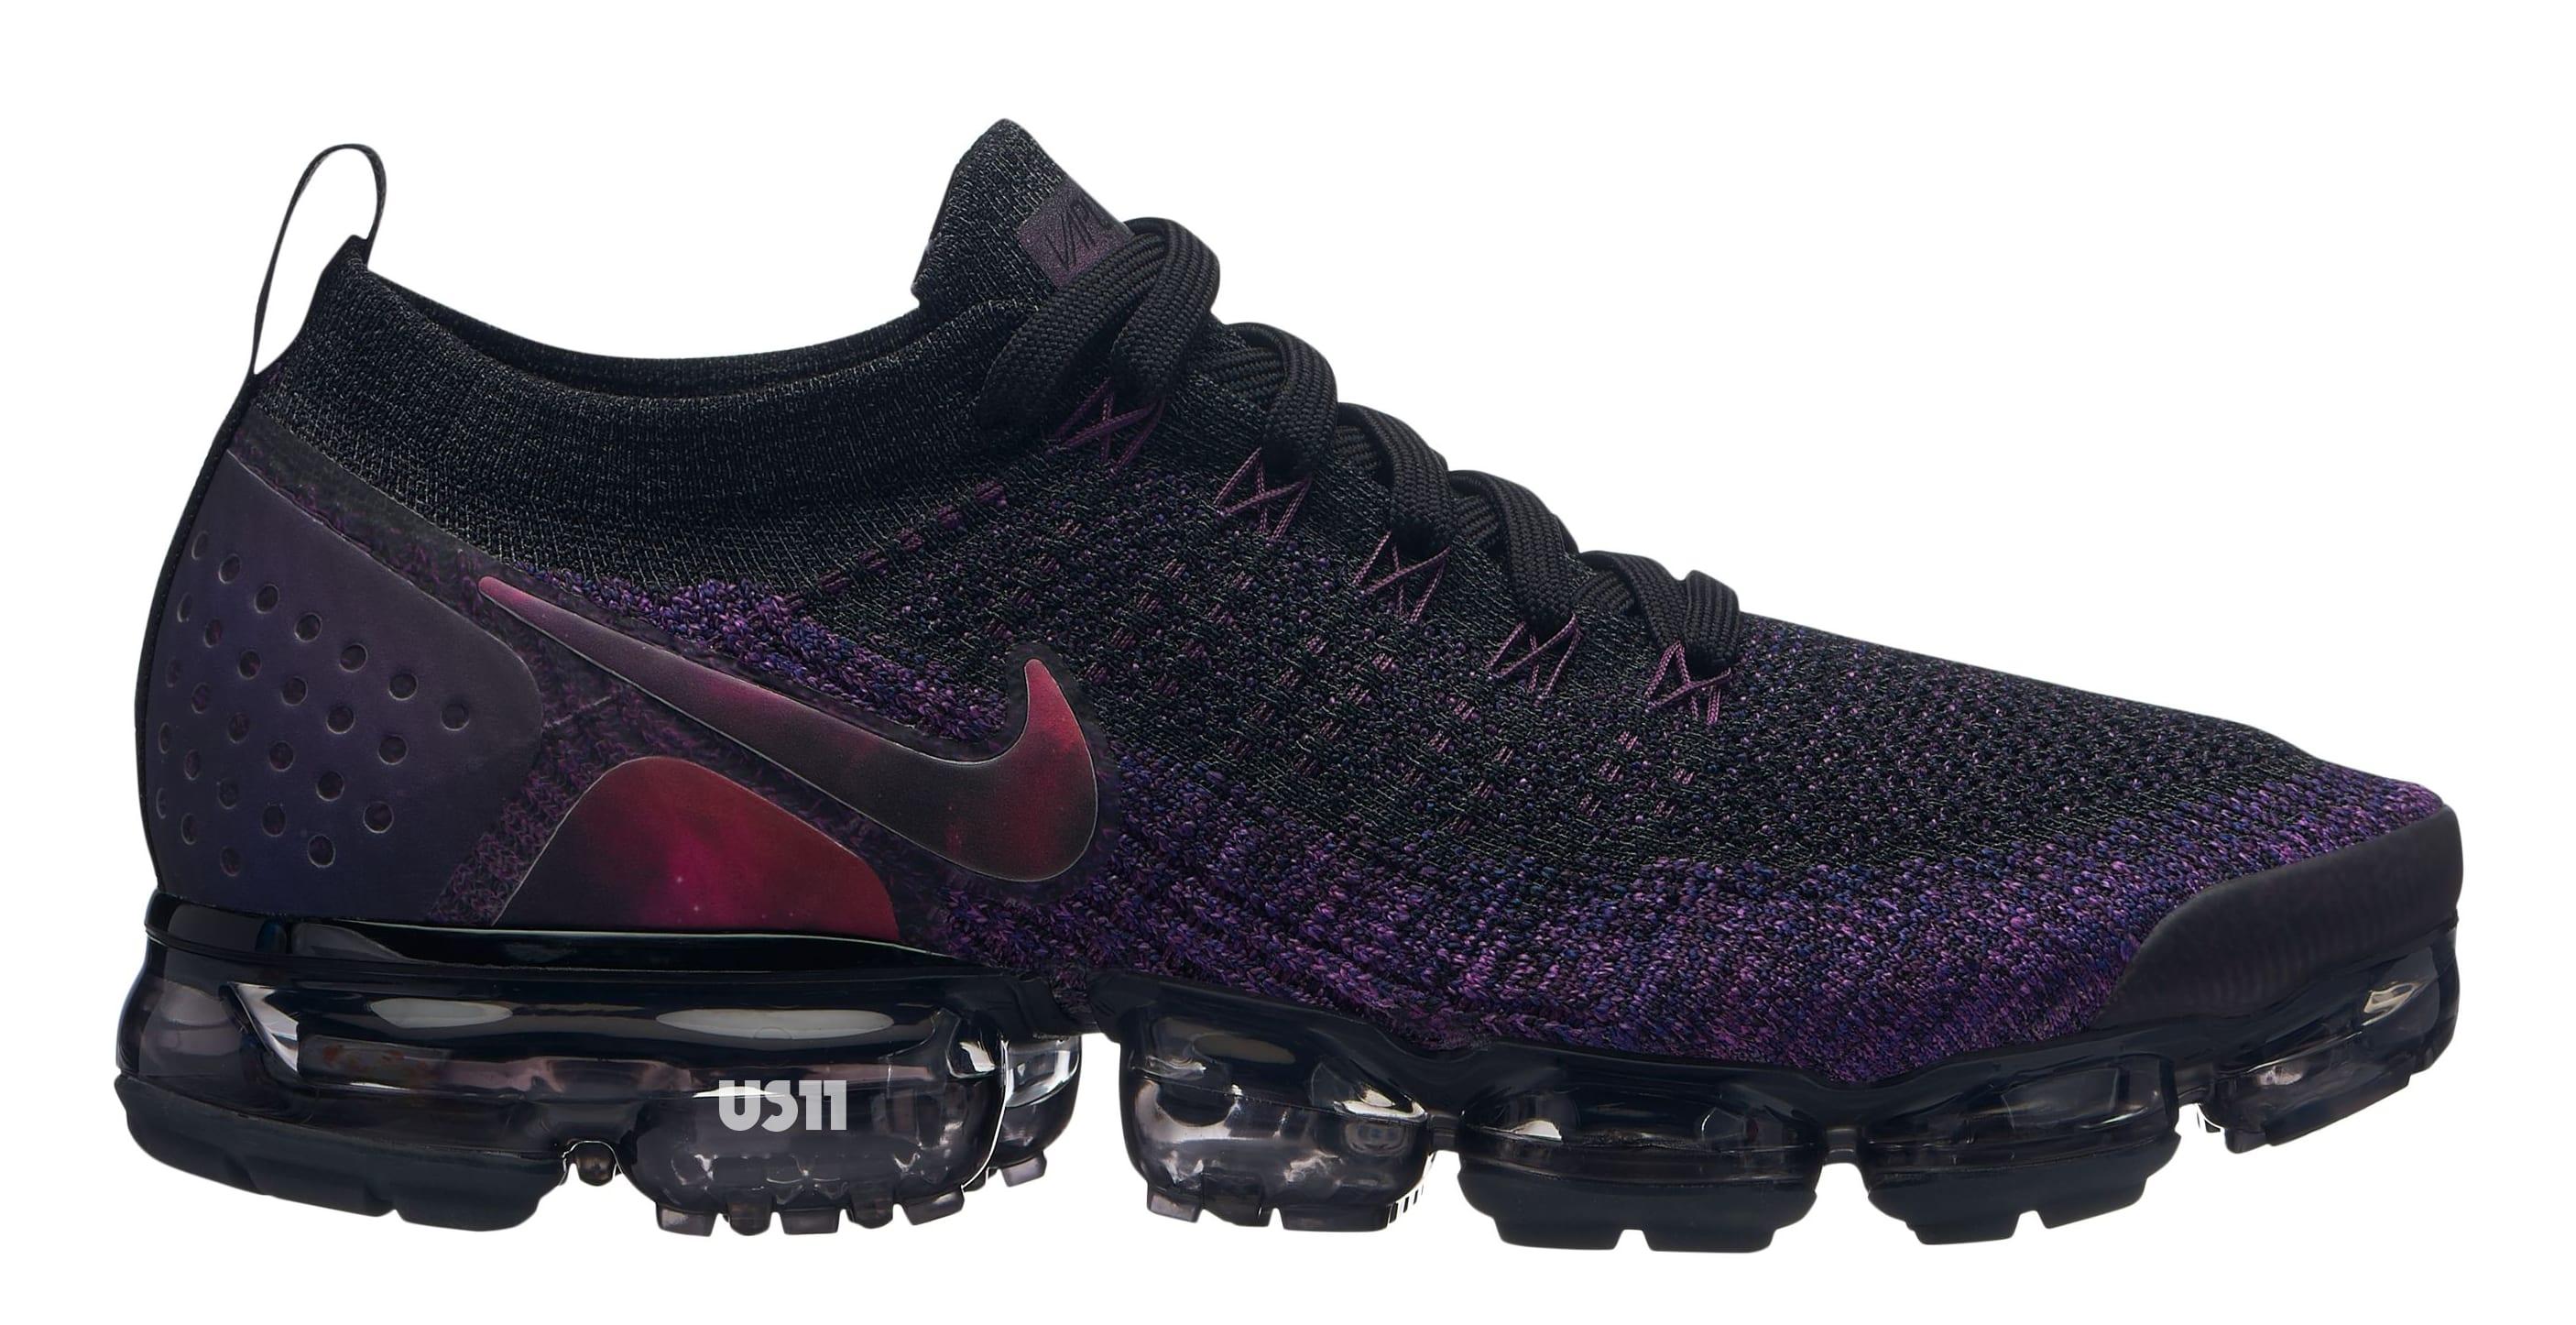 Nike Air VaporMax 2.0 Black/Purple